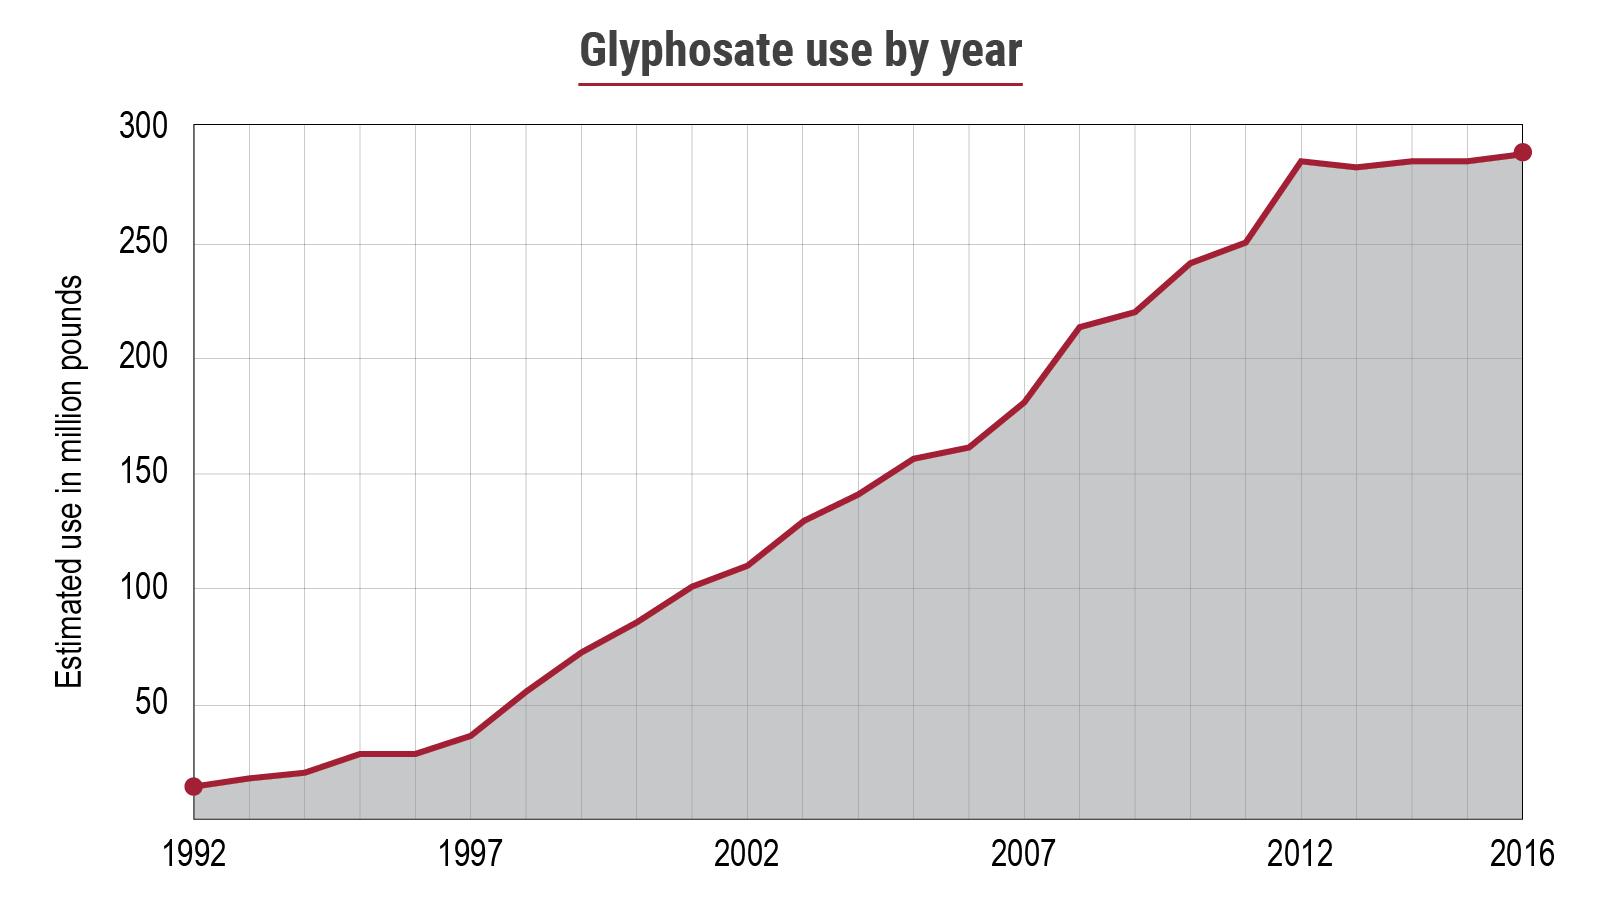 Glyphosate use by year